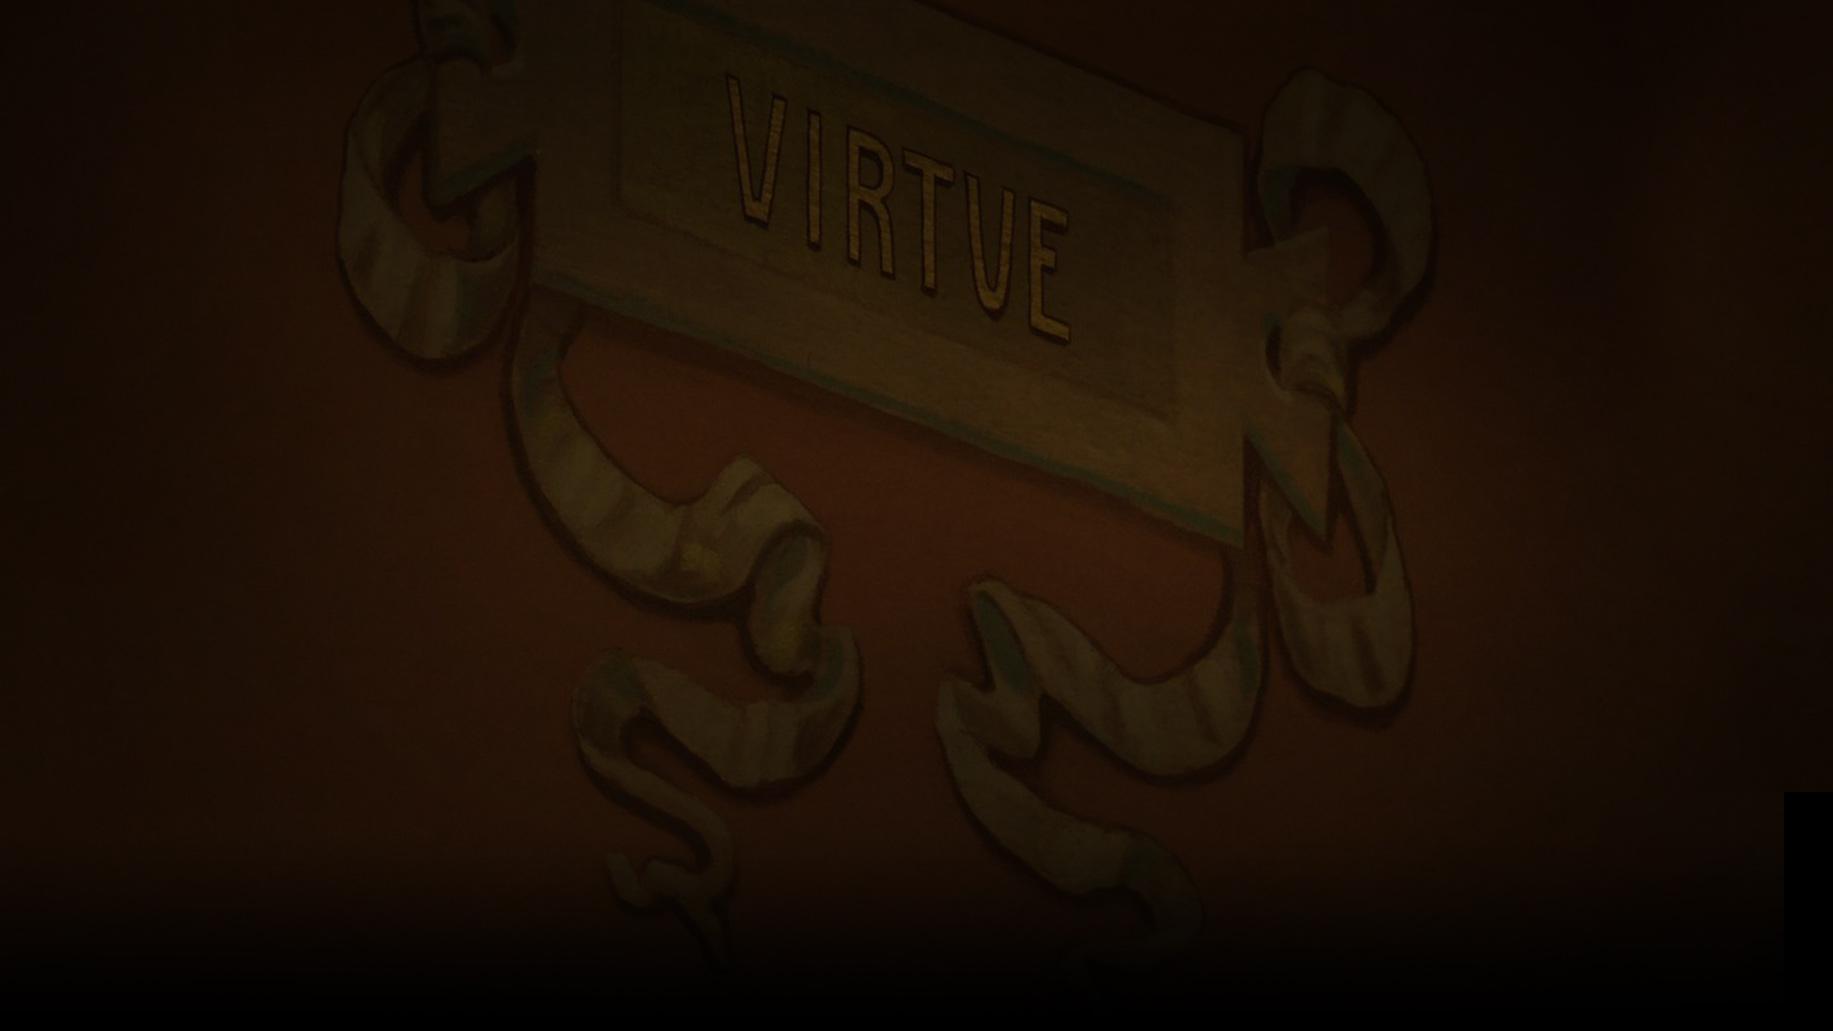 virtue-bg